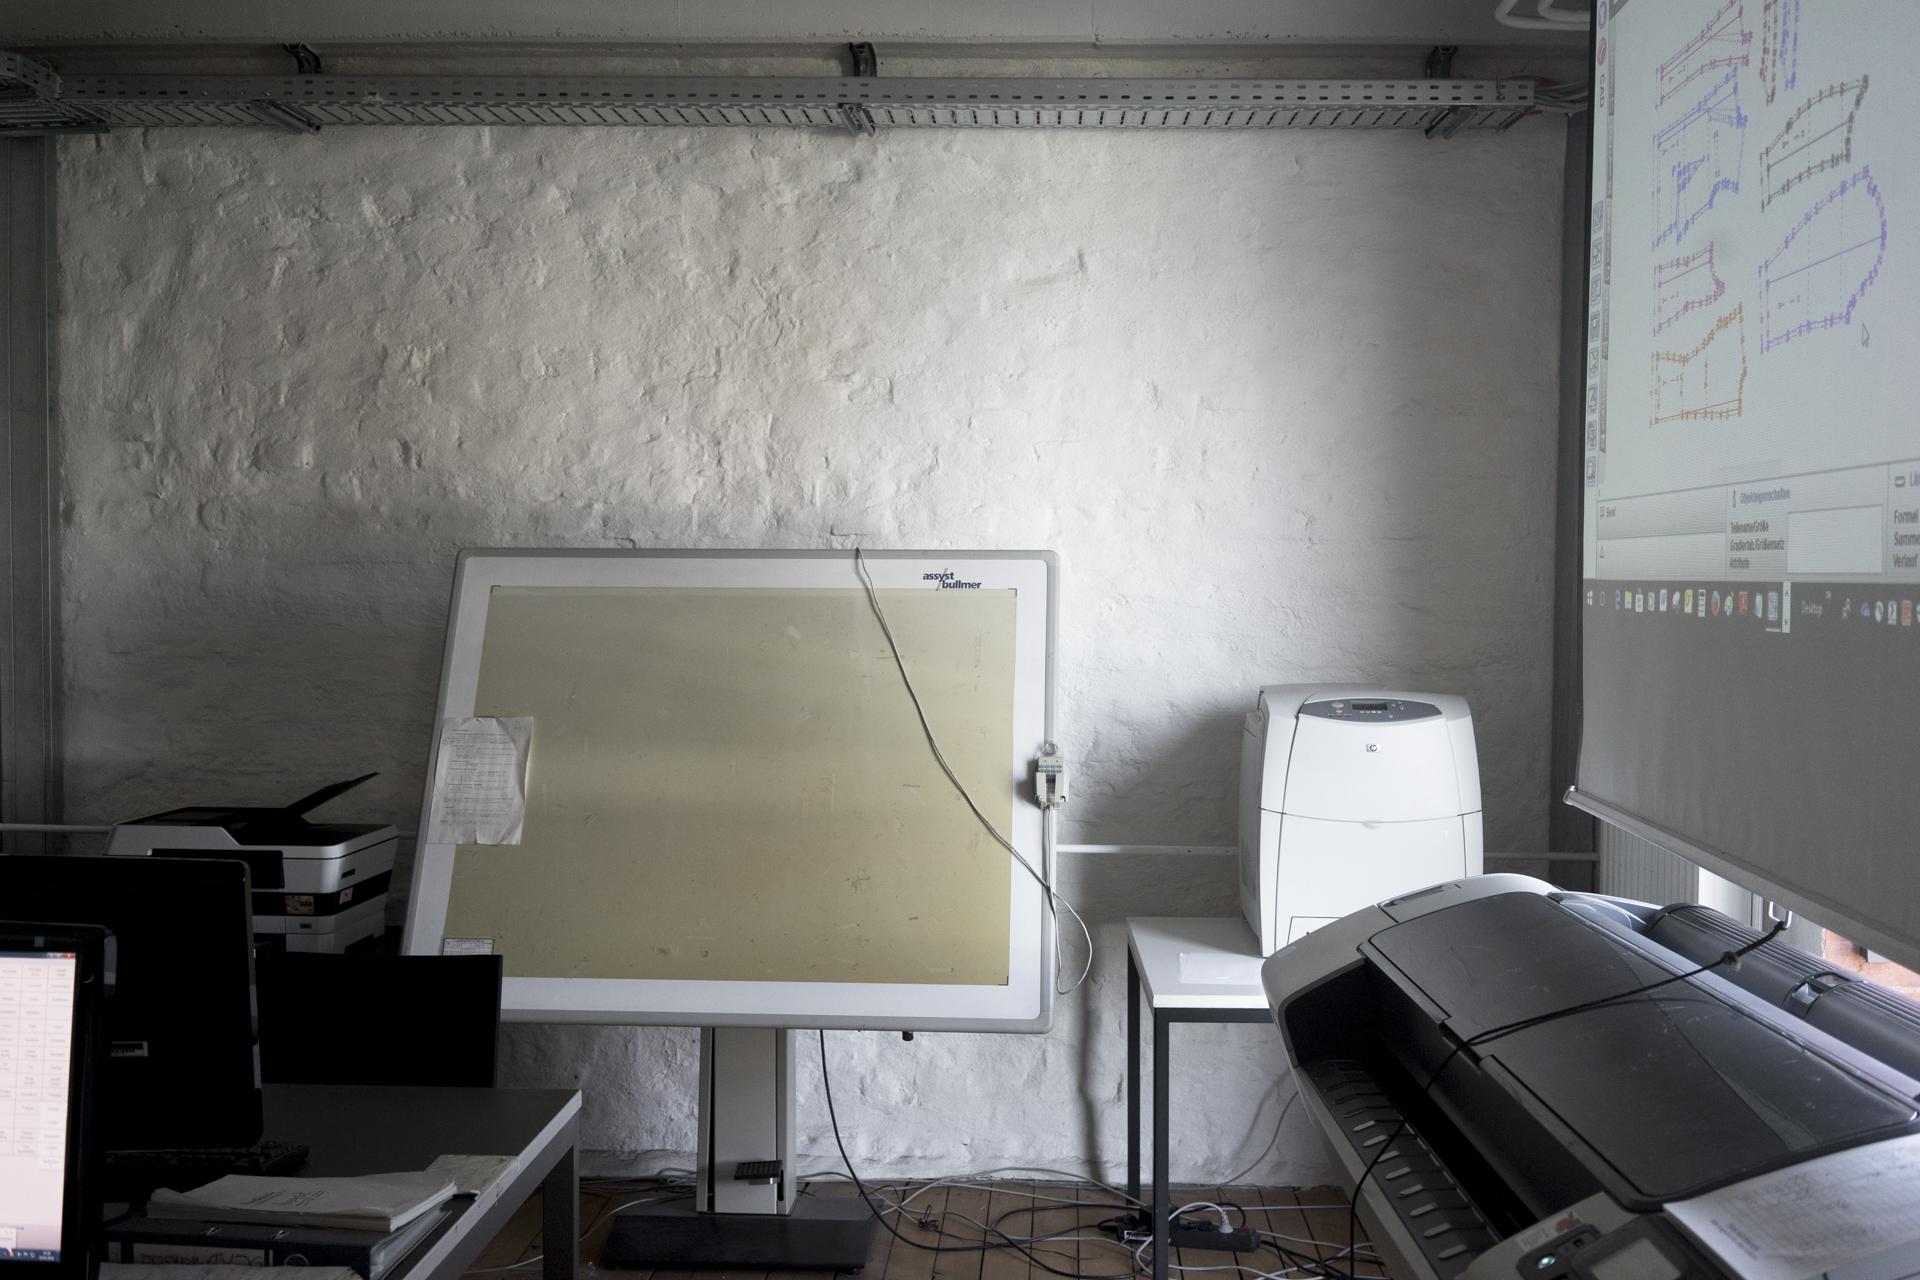 Werkstatt Bild